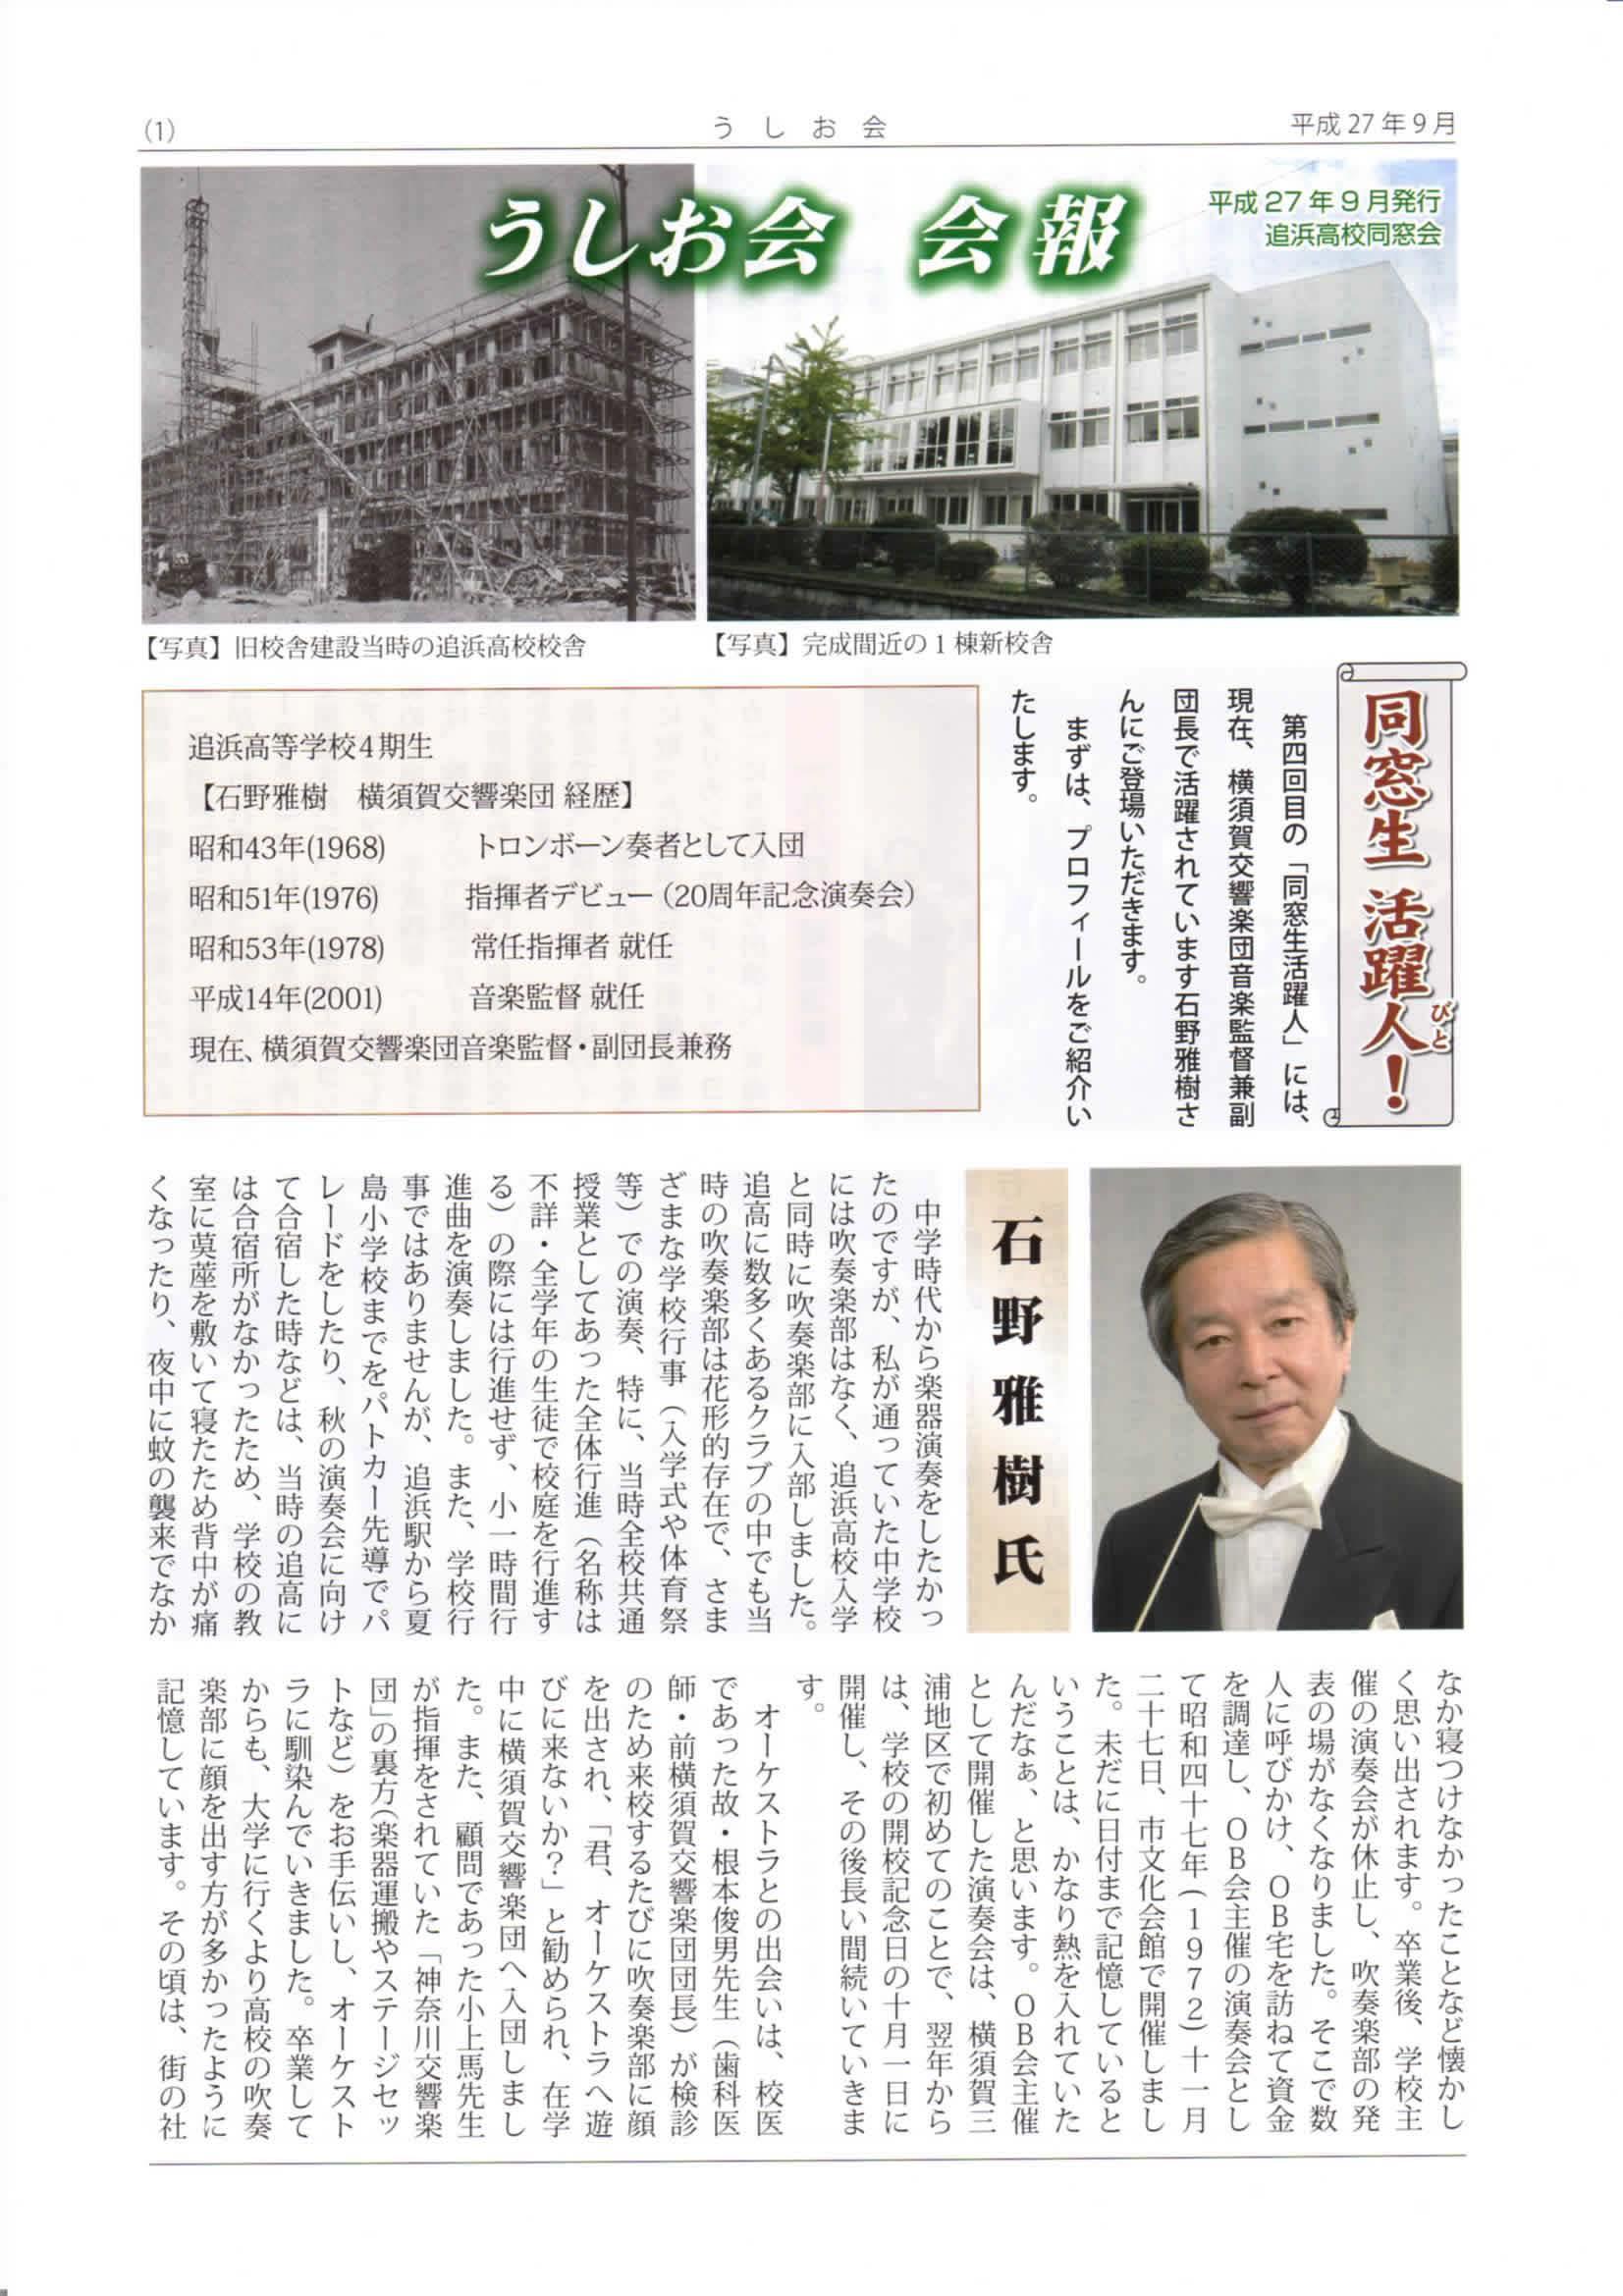 http://www.xn--p8ji2b326tgf0astg8i7difs.jp/ushio-info/images/ushio_201509_1.jpg